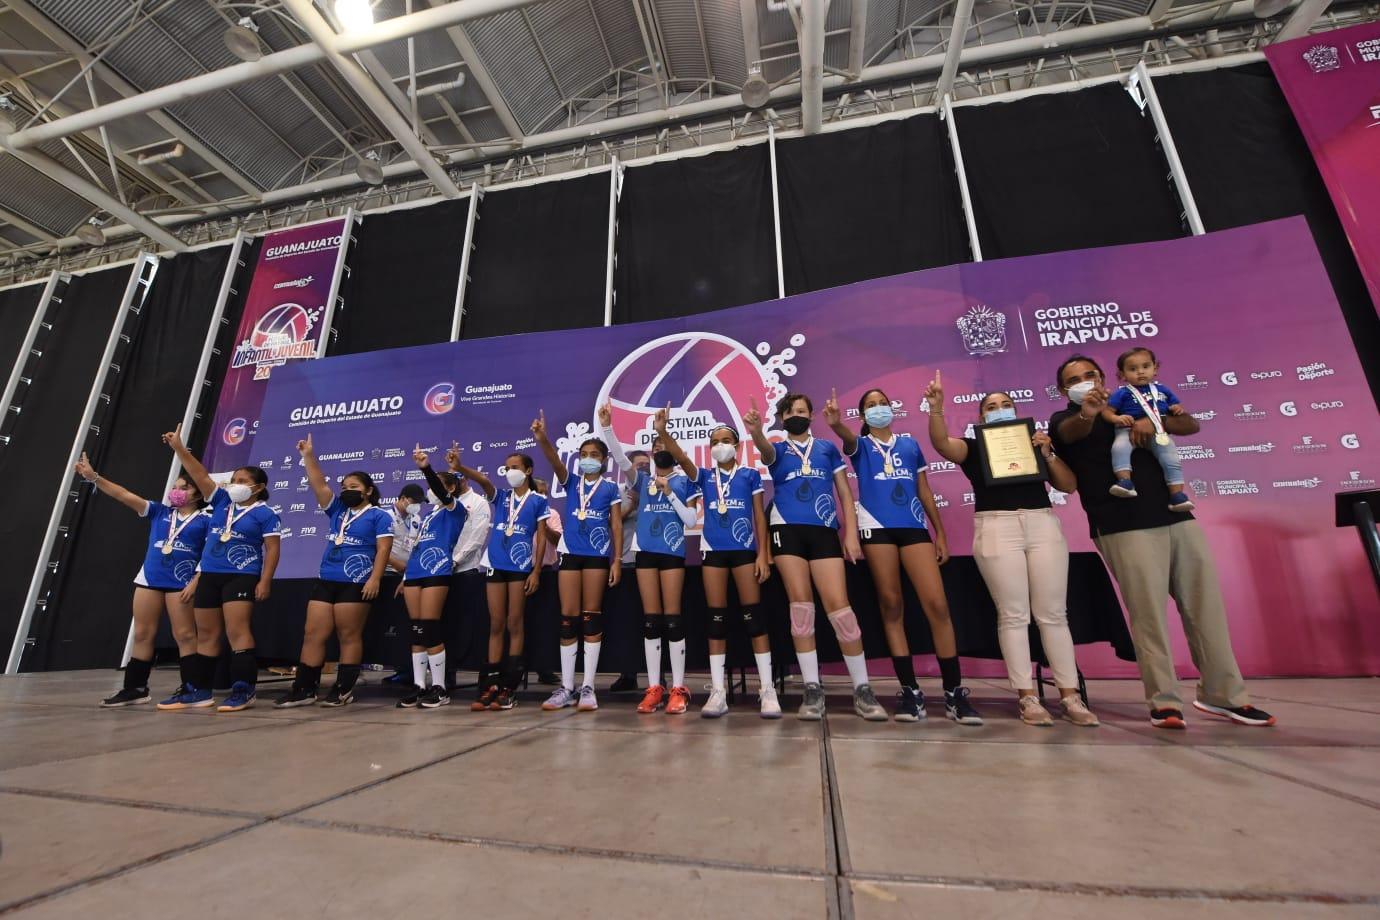 Concluyó festival nacional de volibol; participaron 4 mil 500 deportistas